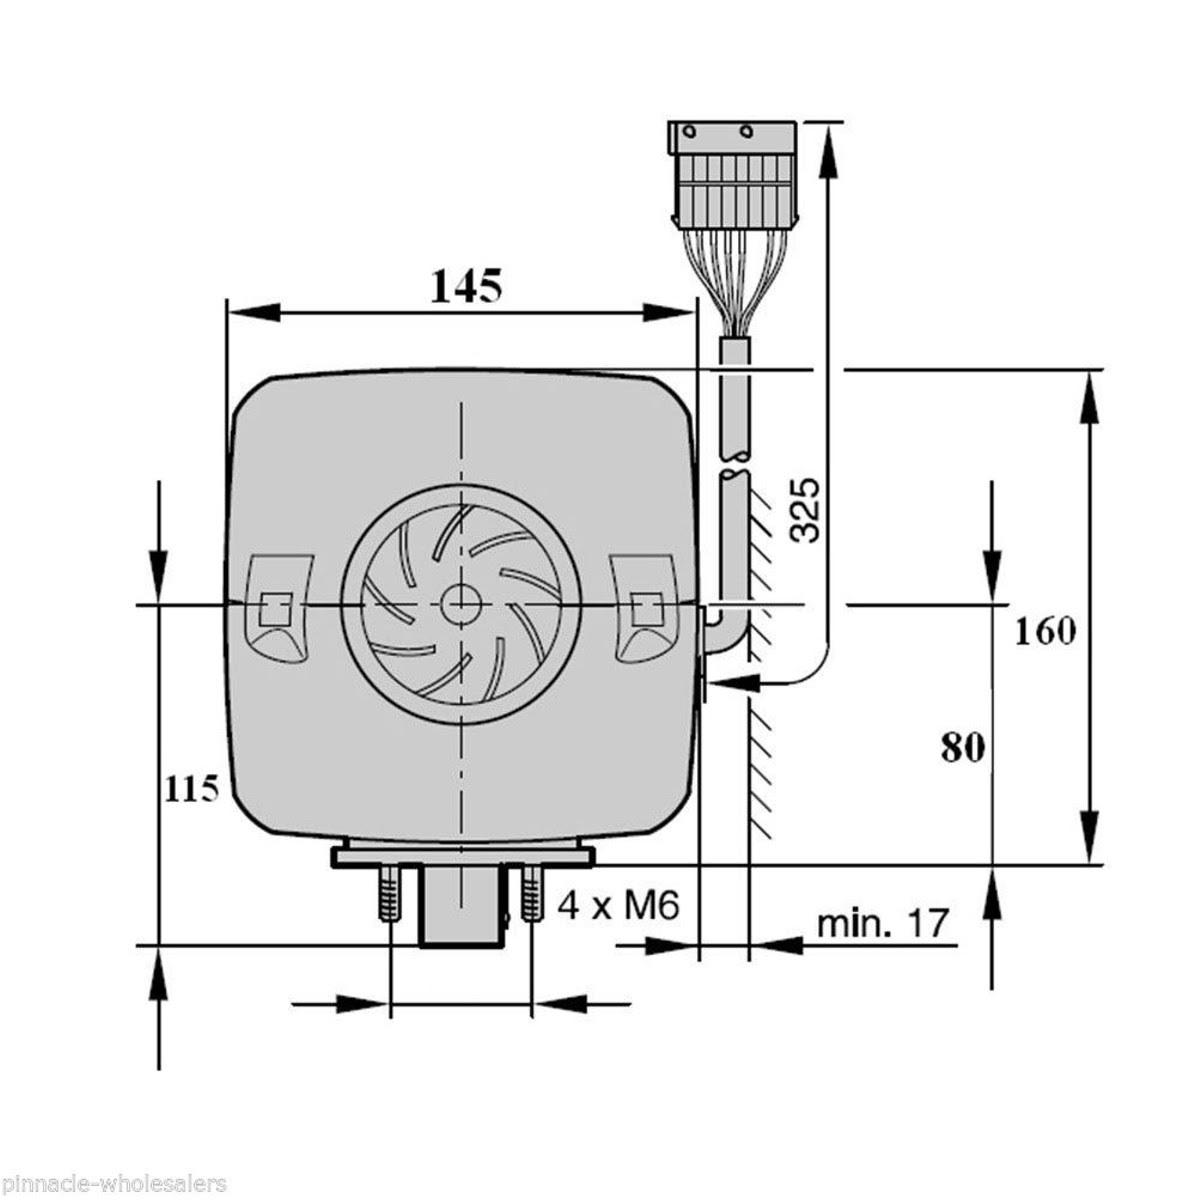 Wiring Diagram Database Cummins Isx Serpentine Belt Diagram Manual Guide